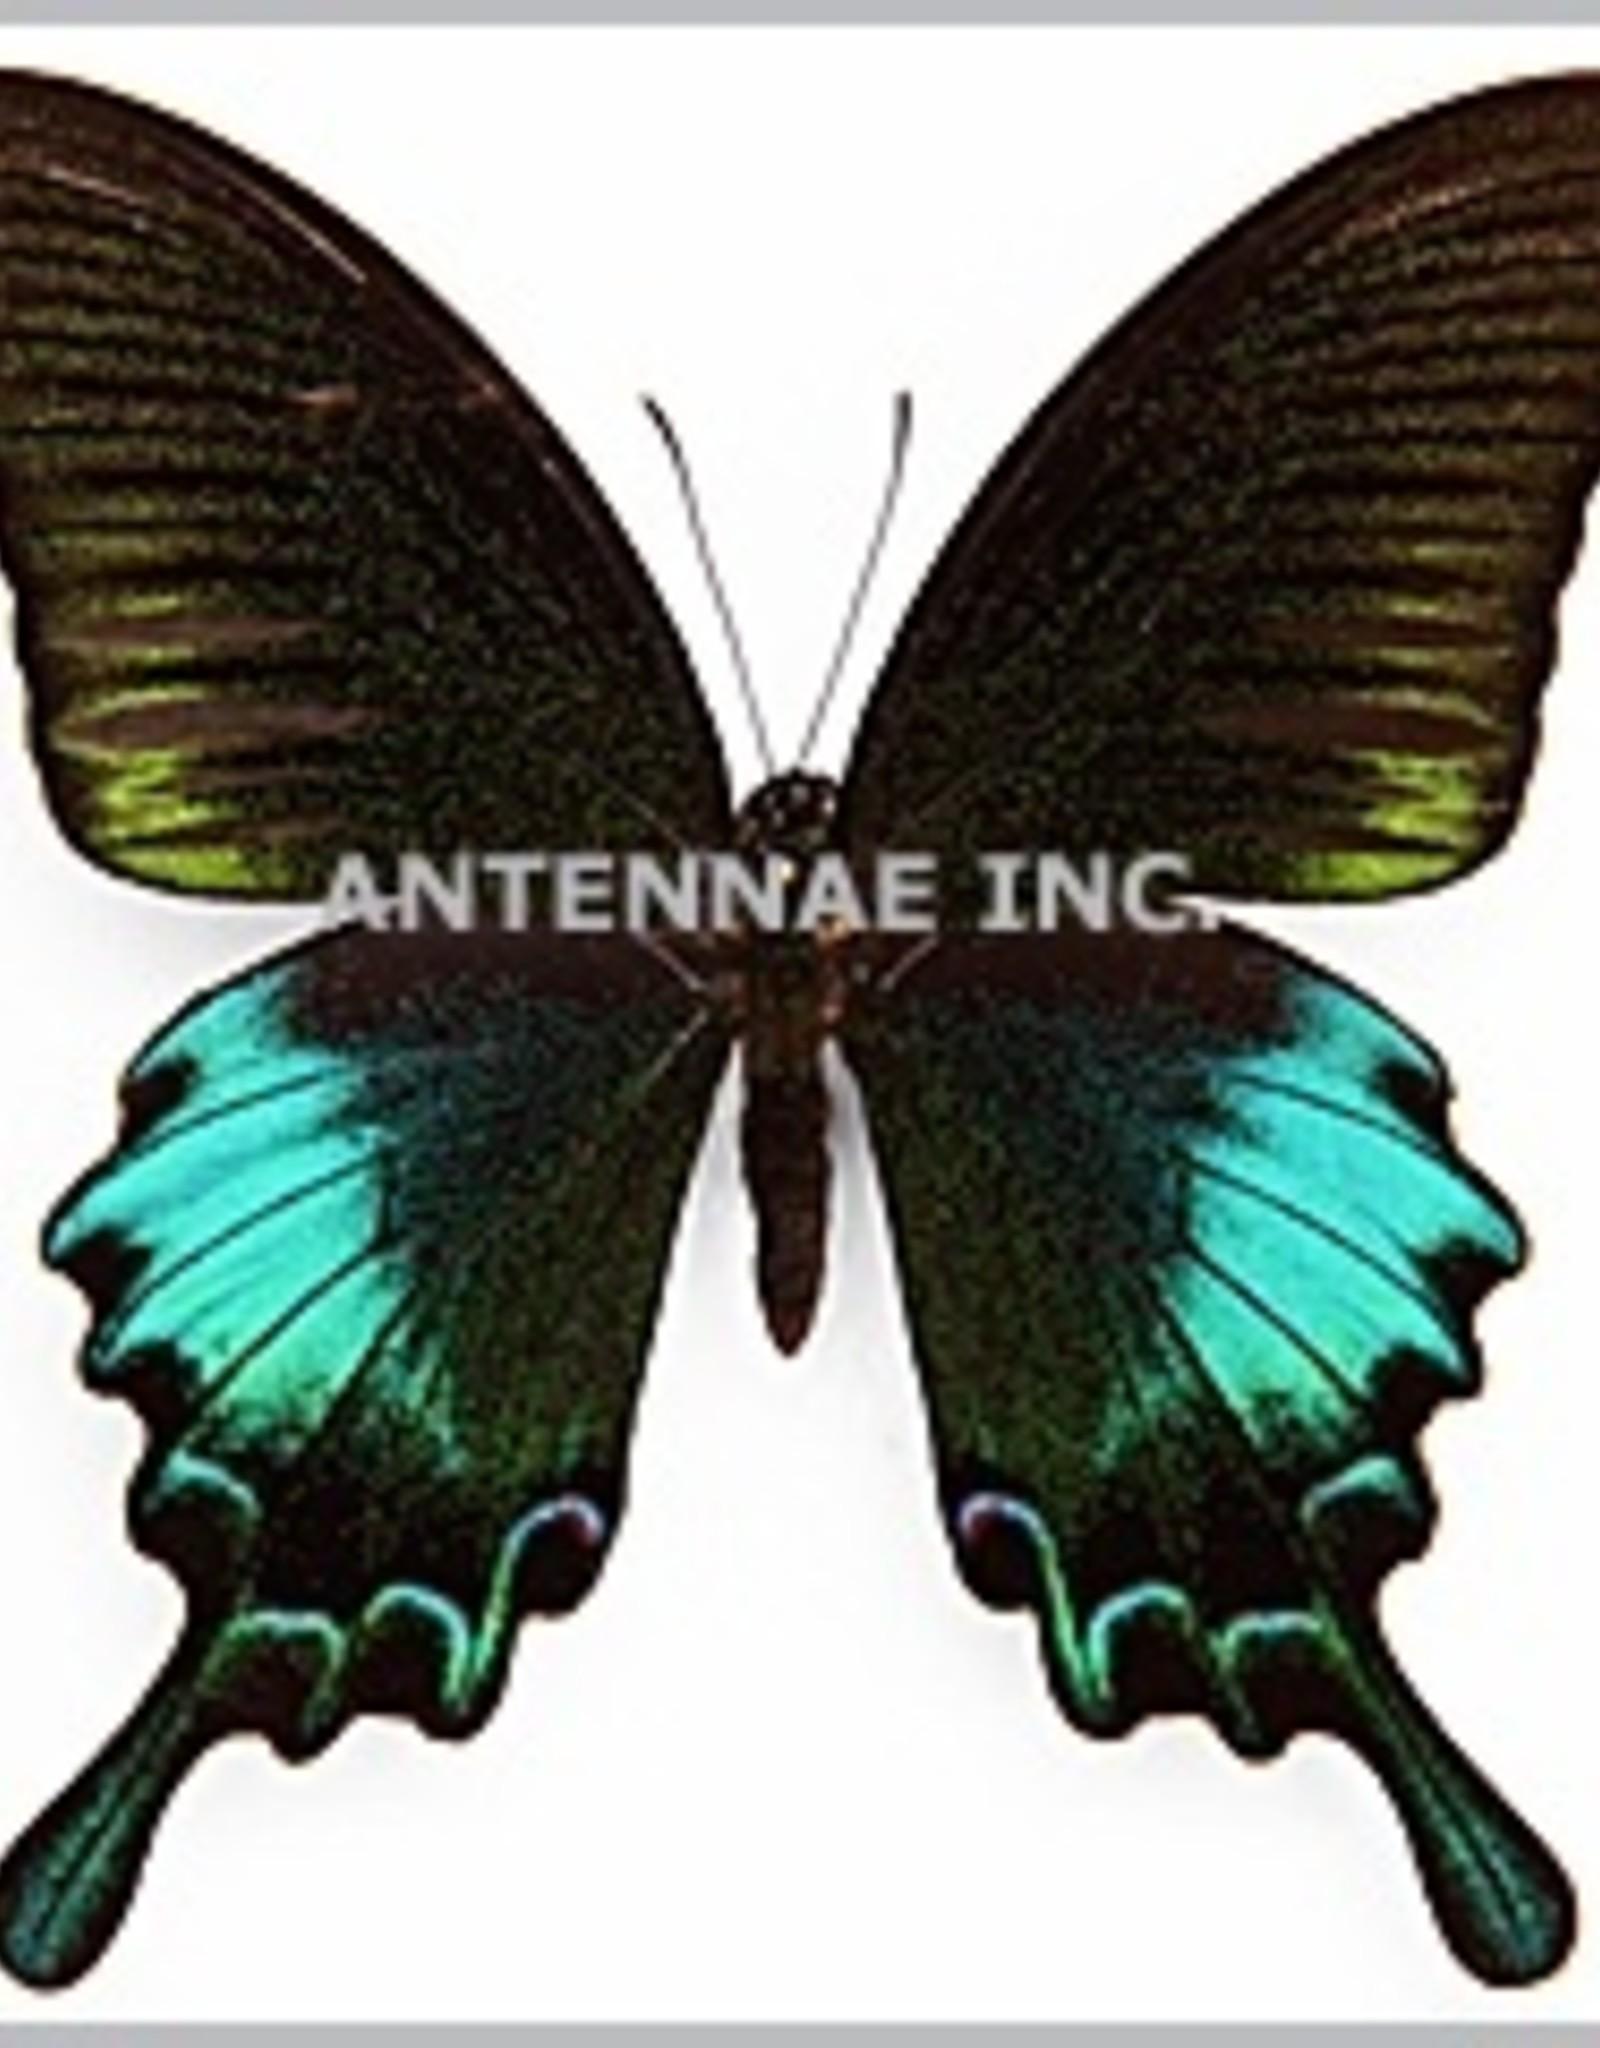 Papilio bianor thrasymedes F A1 Taiwan